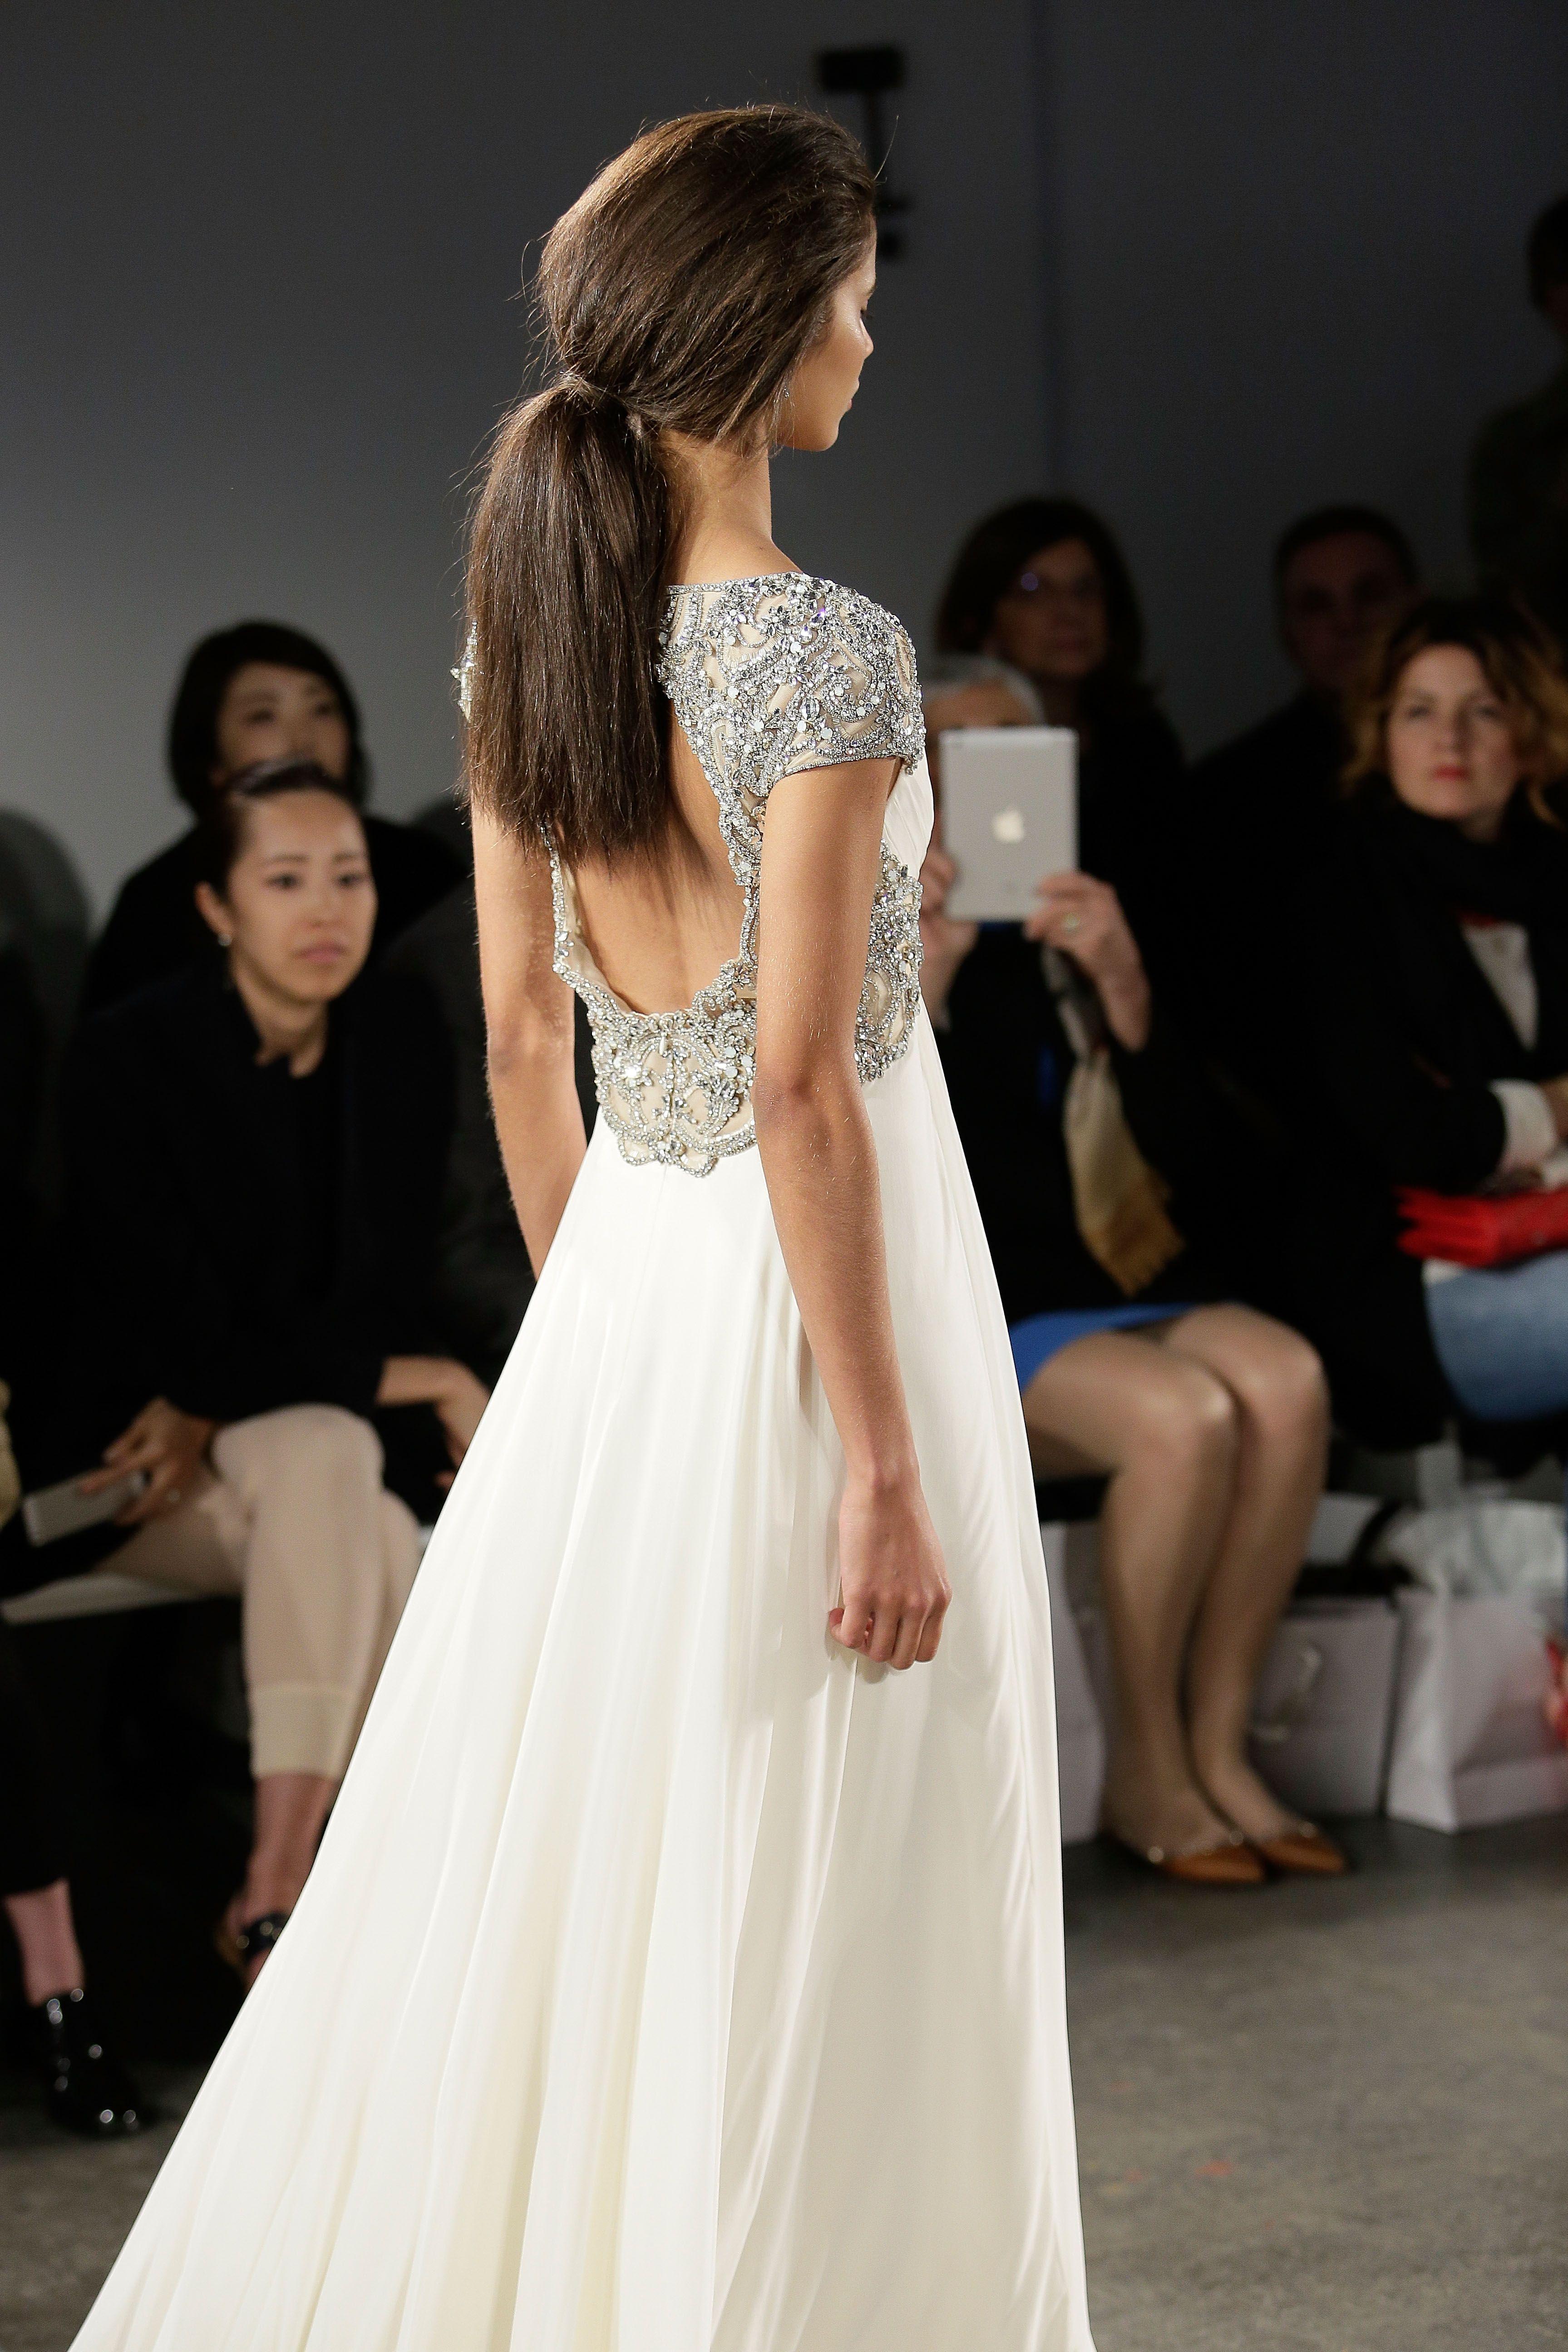 f35c45387e2 Jenny Packham 2015 Bridal Collection - Noa Wedding Dress (Back ...